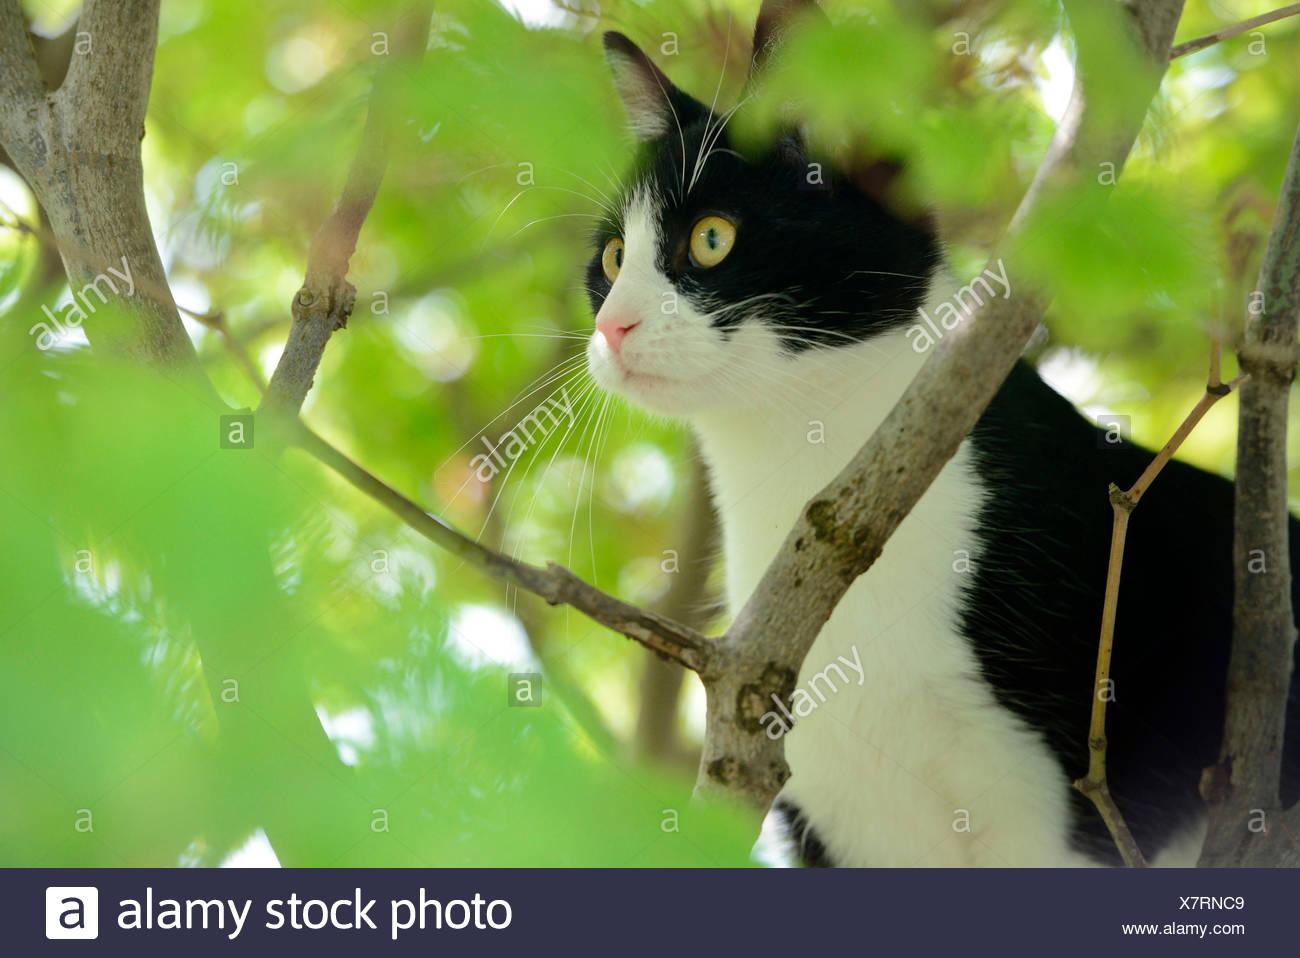 Domestic Cat, kitten climbing in tree - Stock Image